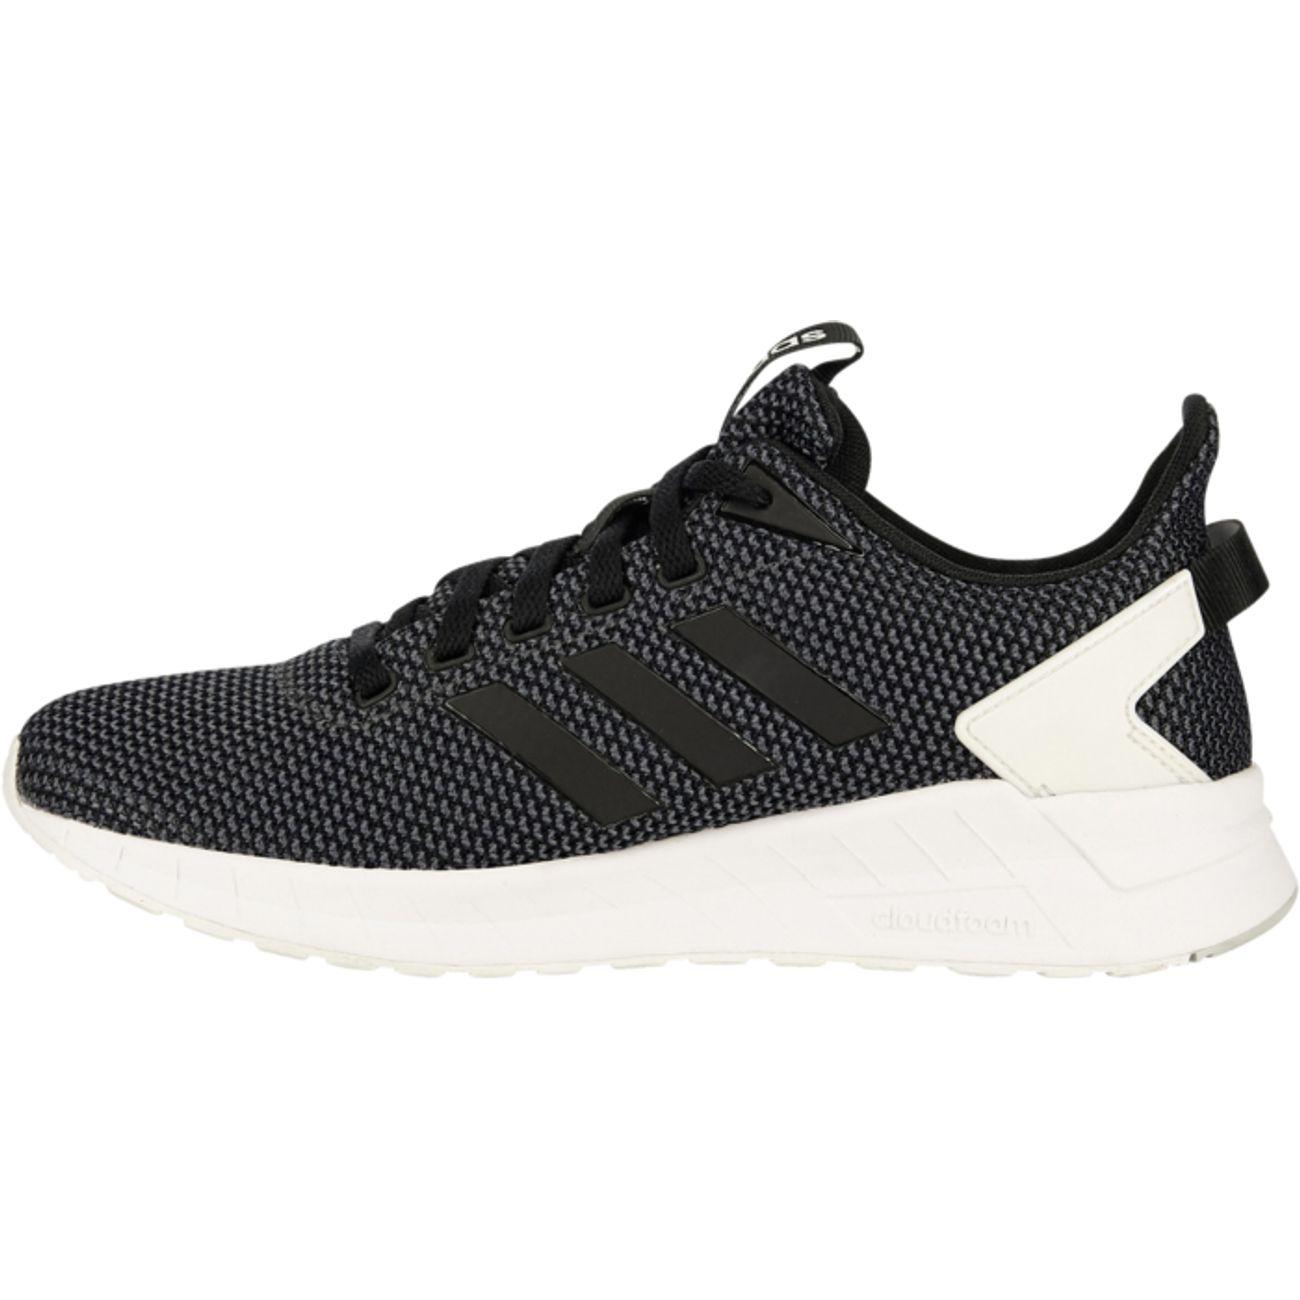 Chaussures adidas Questar Ride – achat pas cher GO Sport